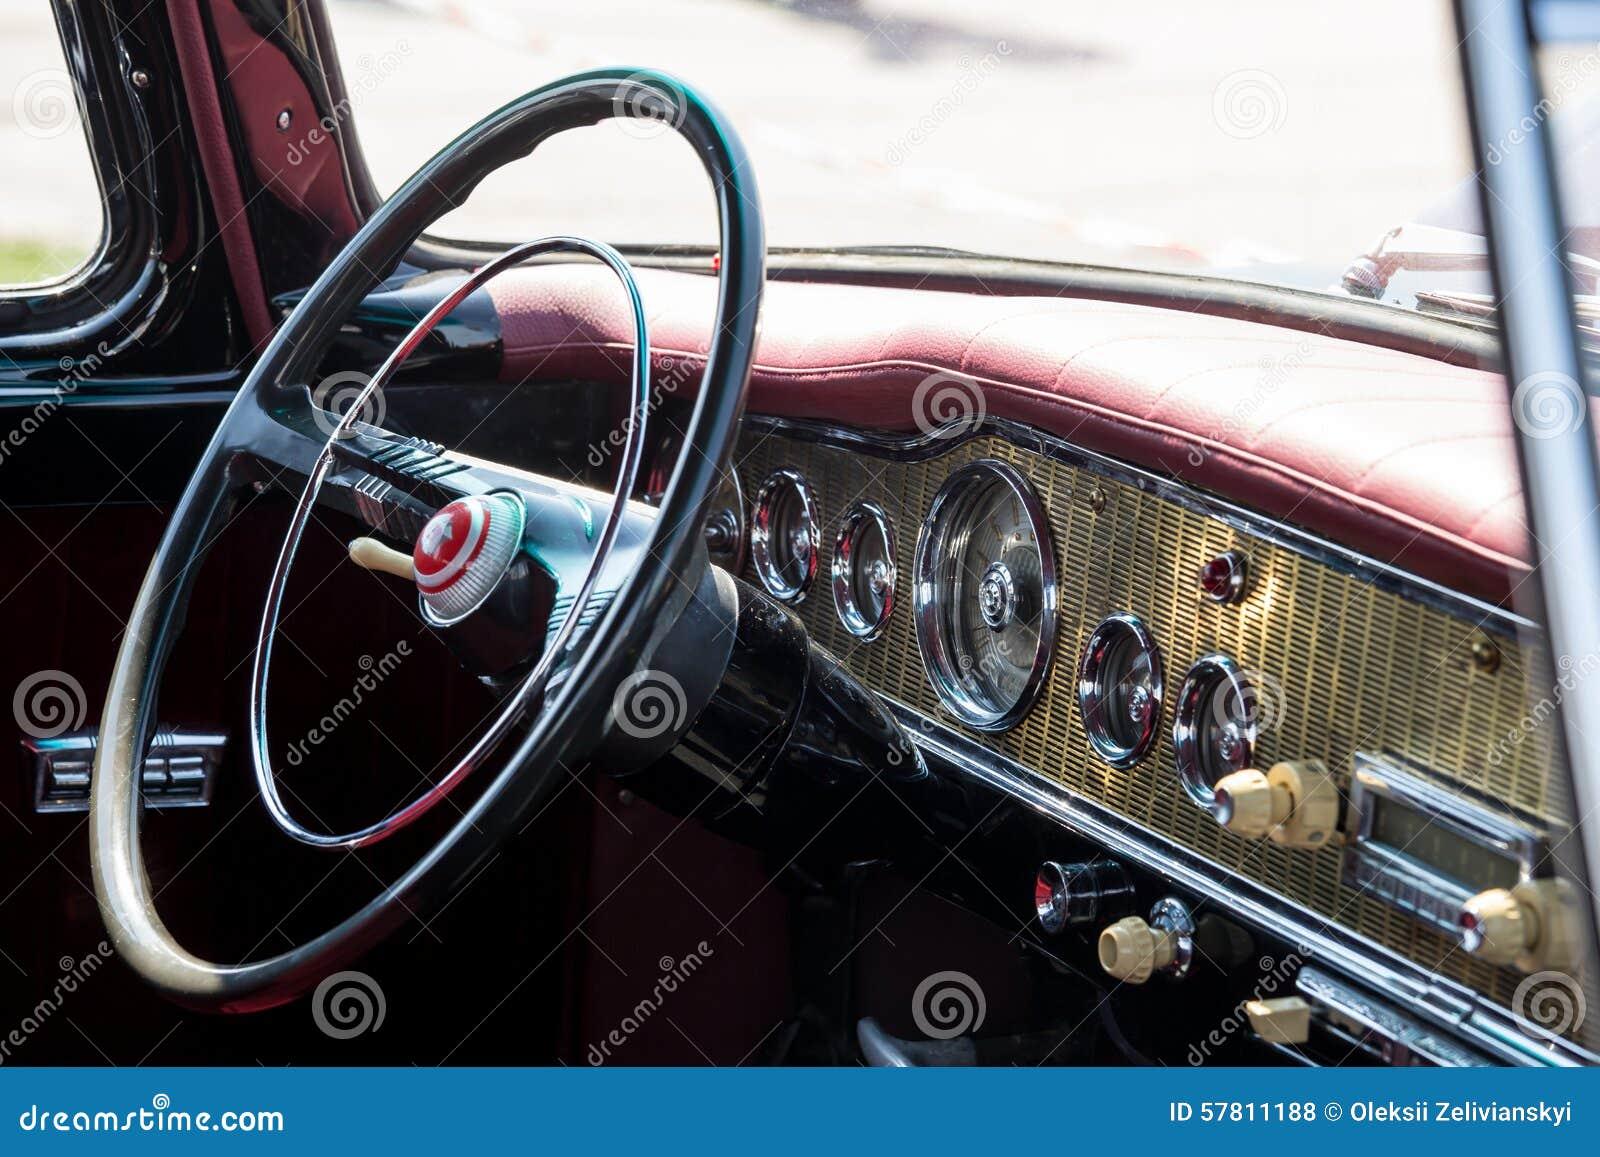 retro car interior stock photo image 57811188. Black Bedroom Furniture Sets. Home Design Ideas